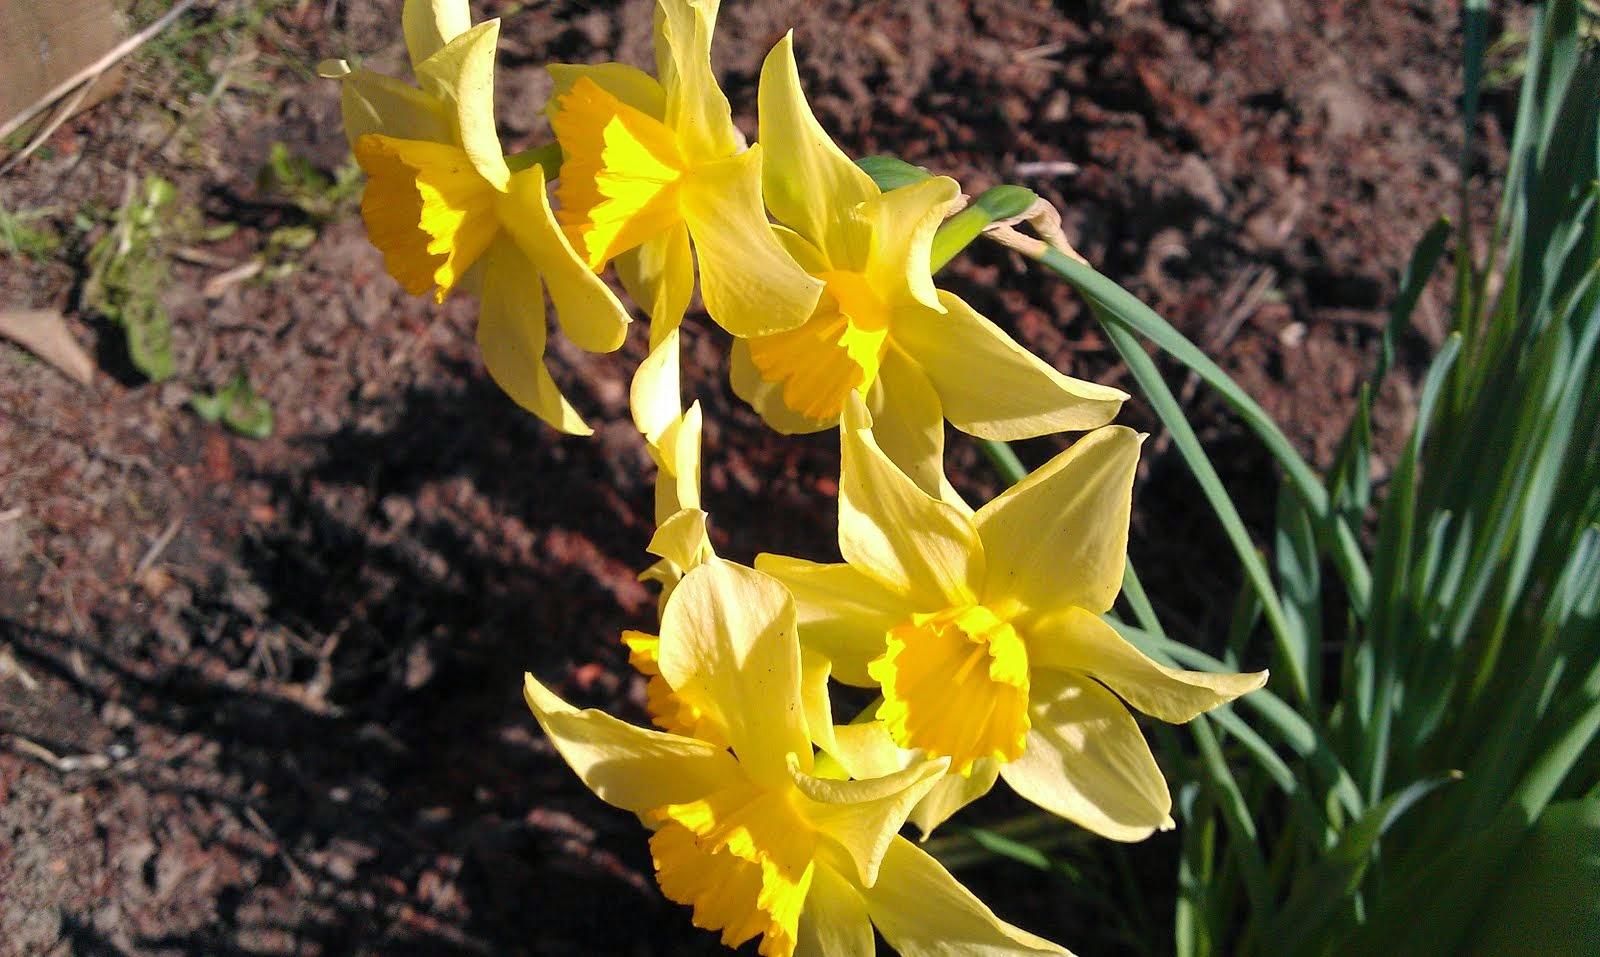 Daffodils in Sunshine!